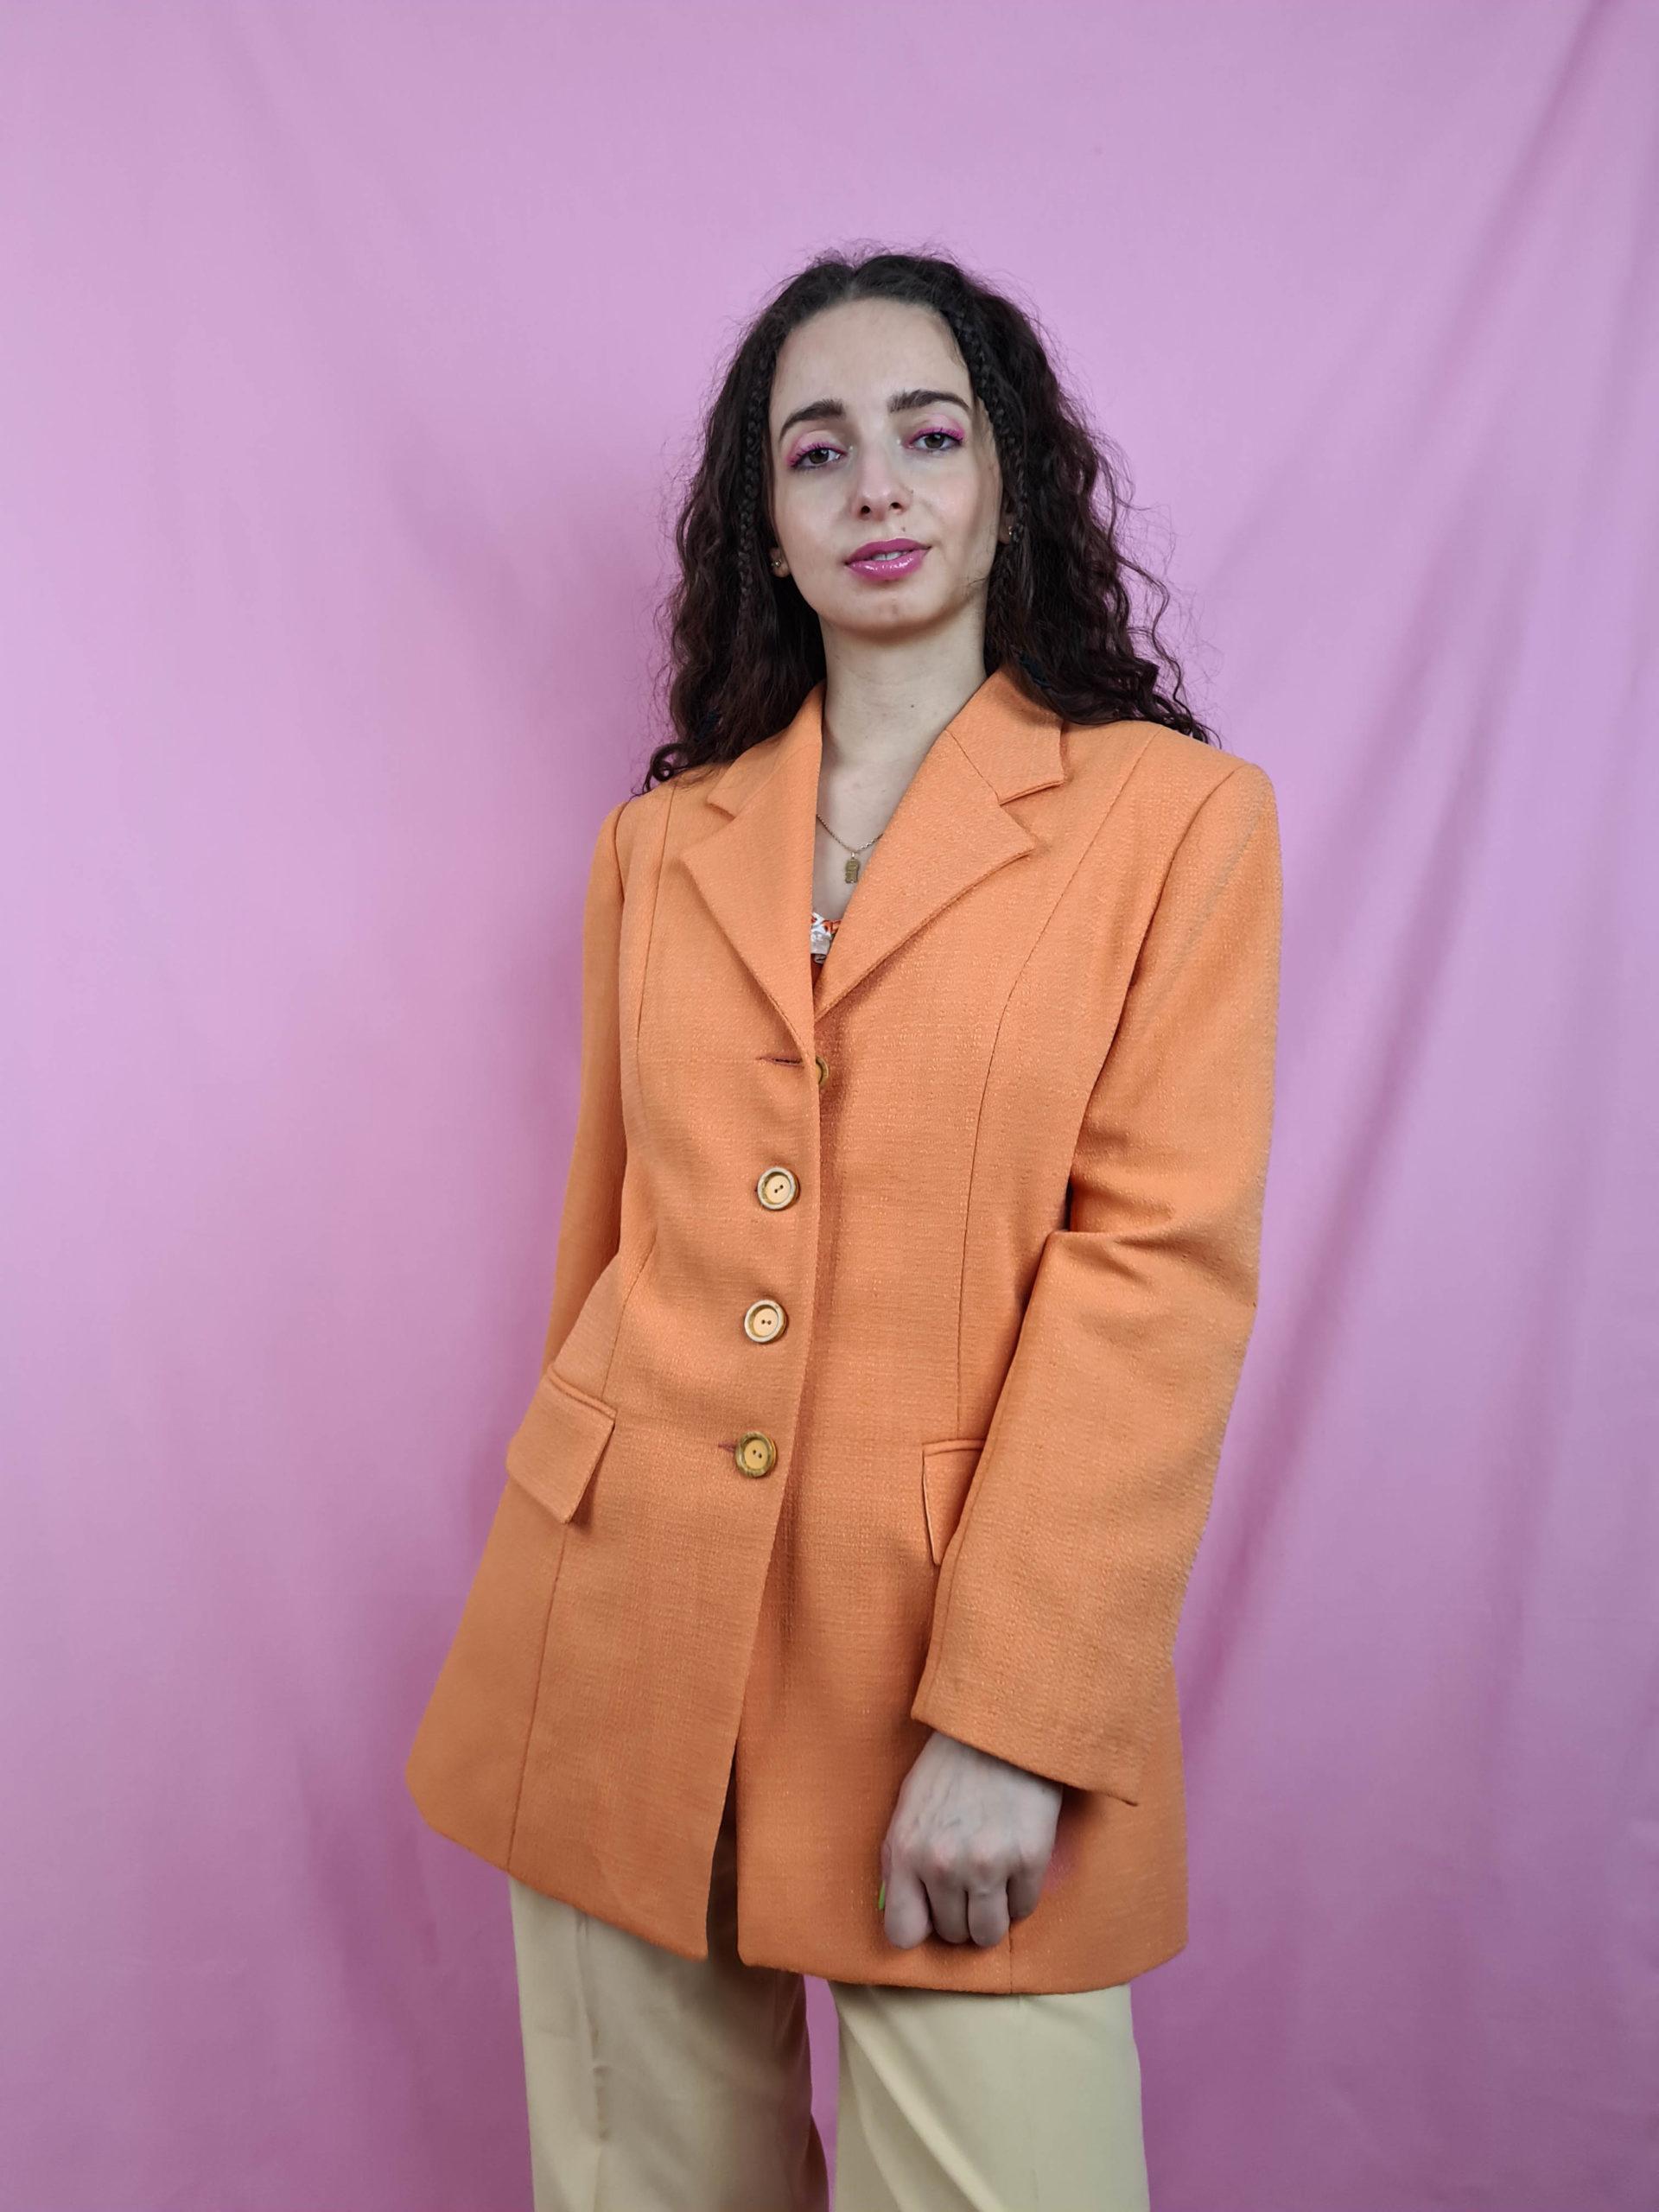 veste blazer orange (4)